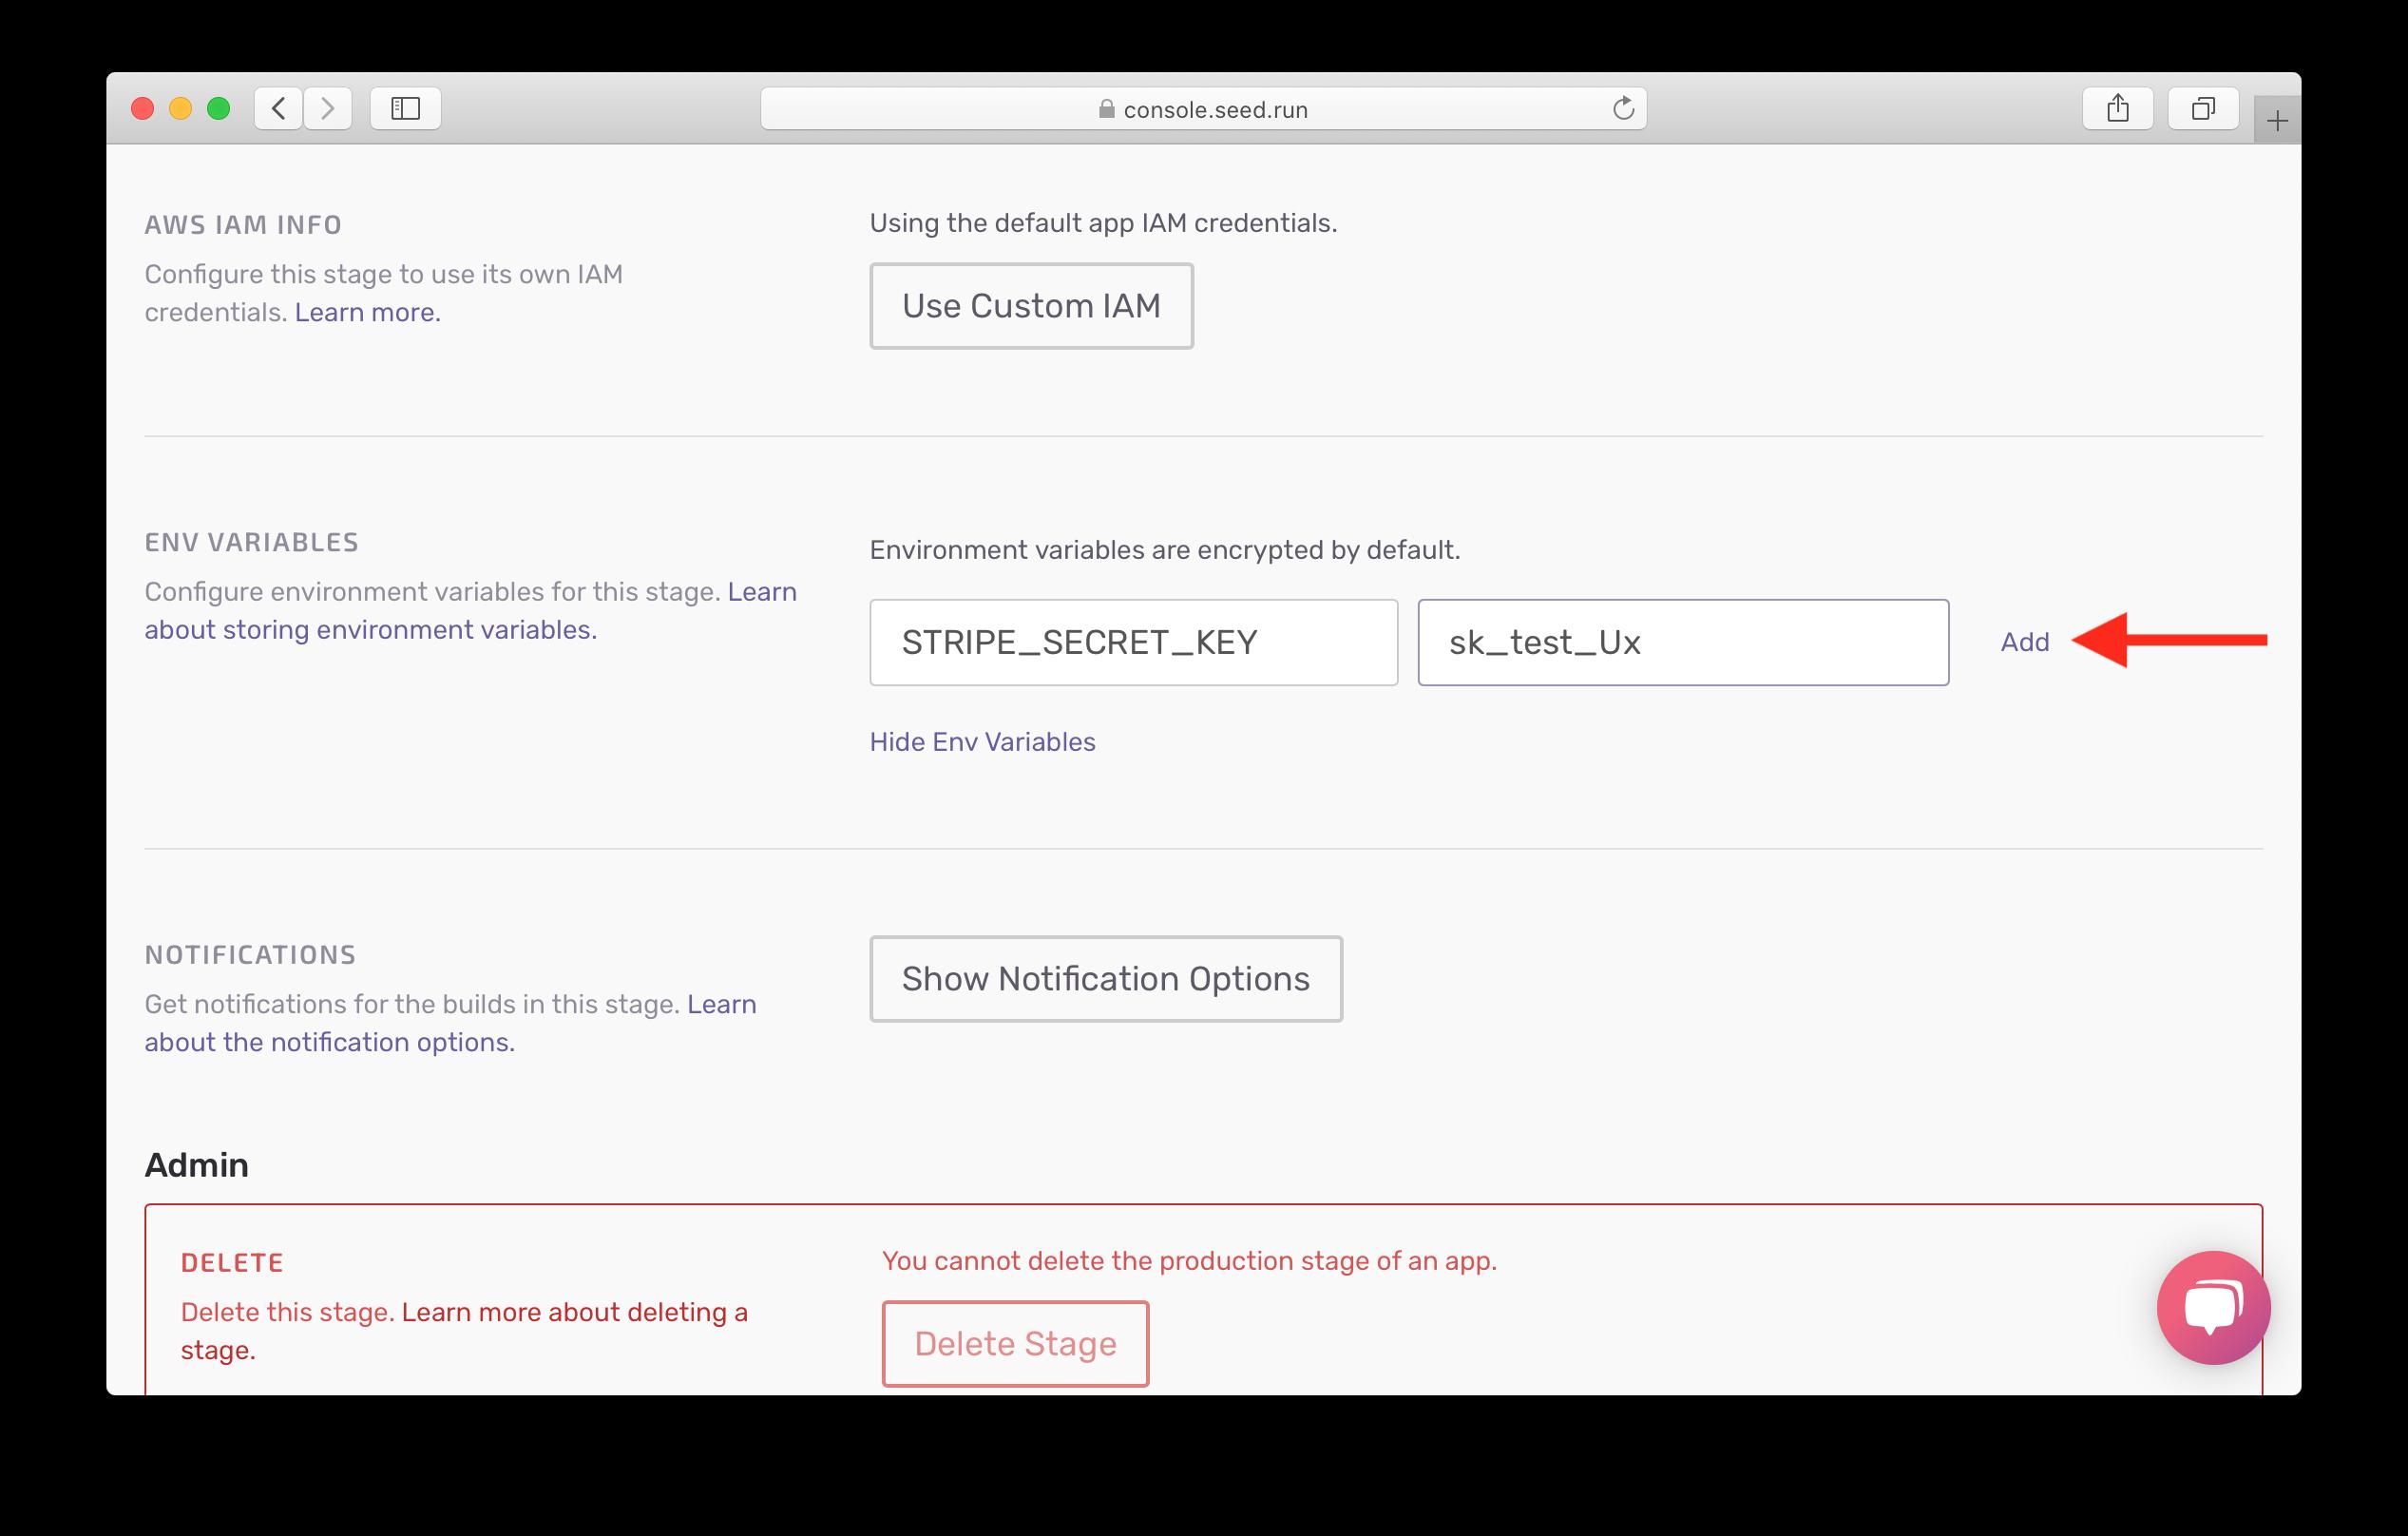 Add secret prod environment variable screenshot